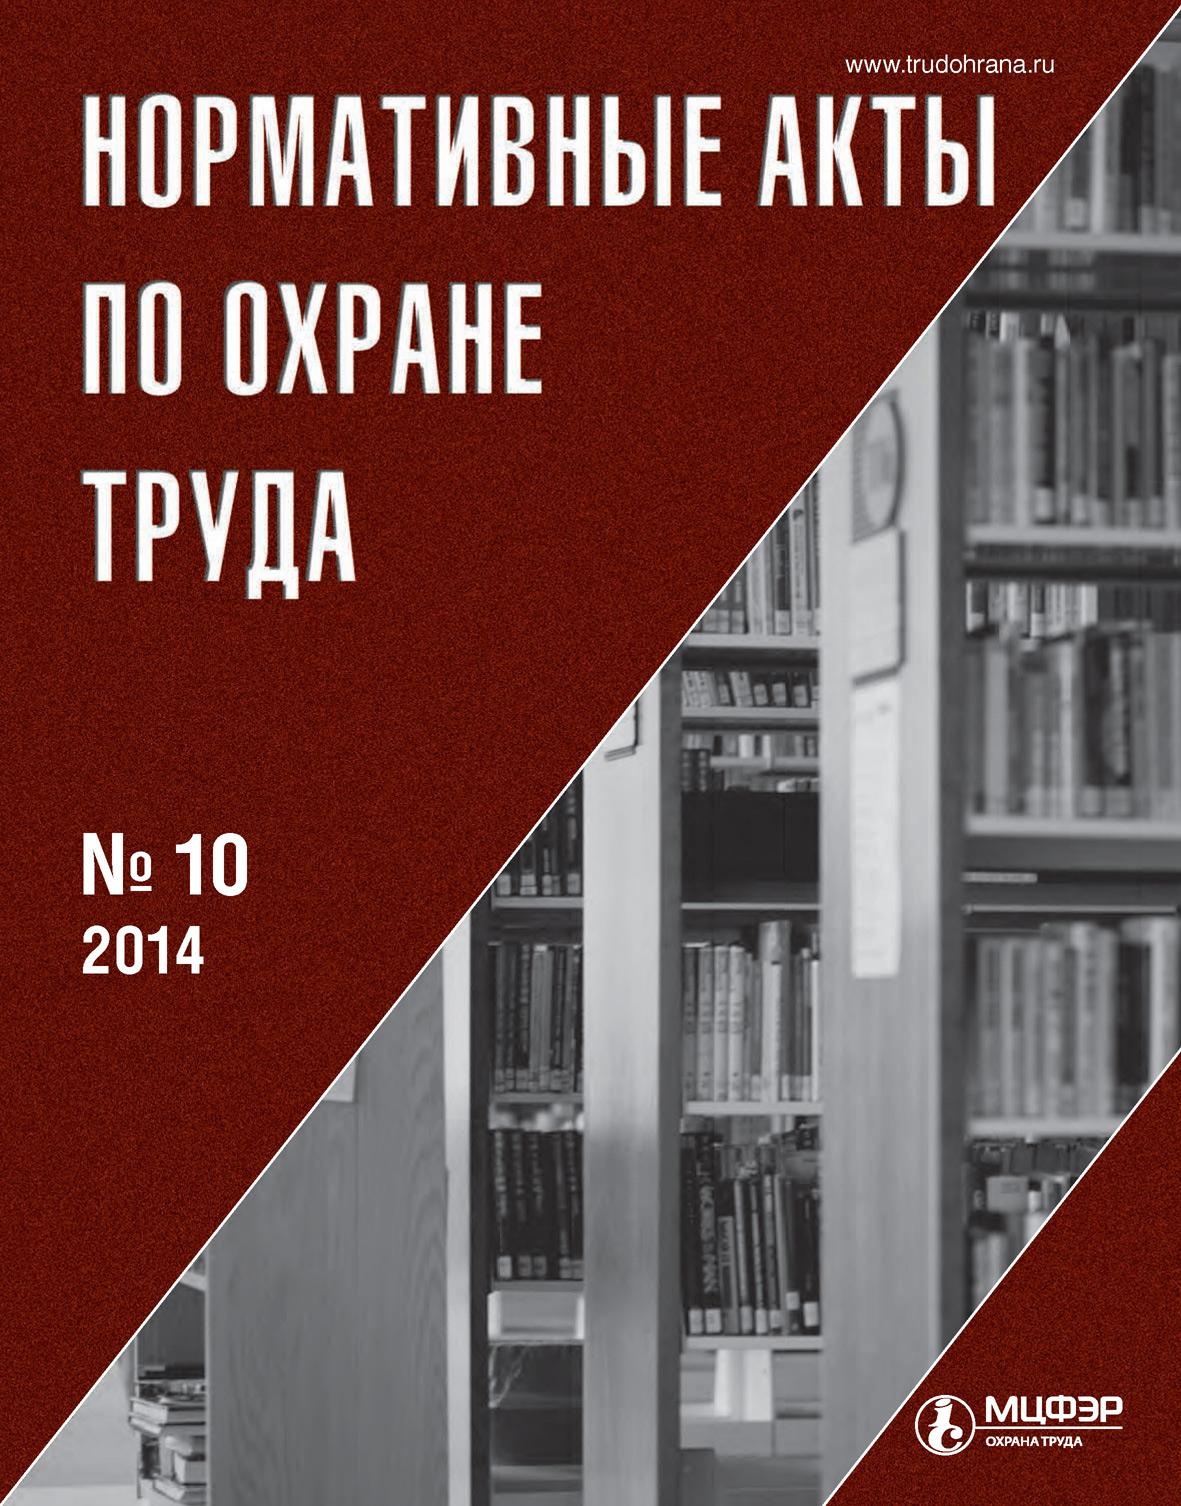 Нормативные акты по охране труда № 10 2014